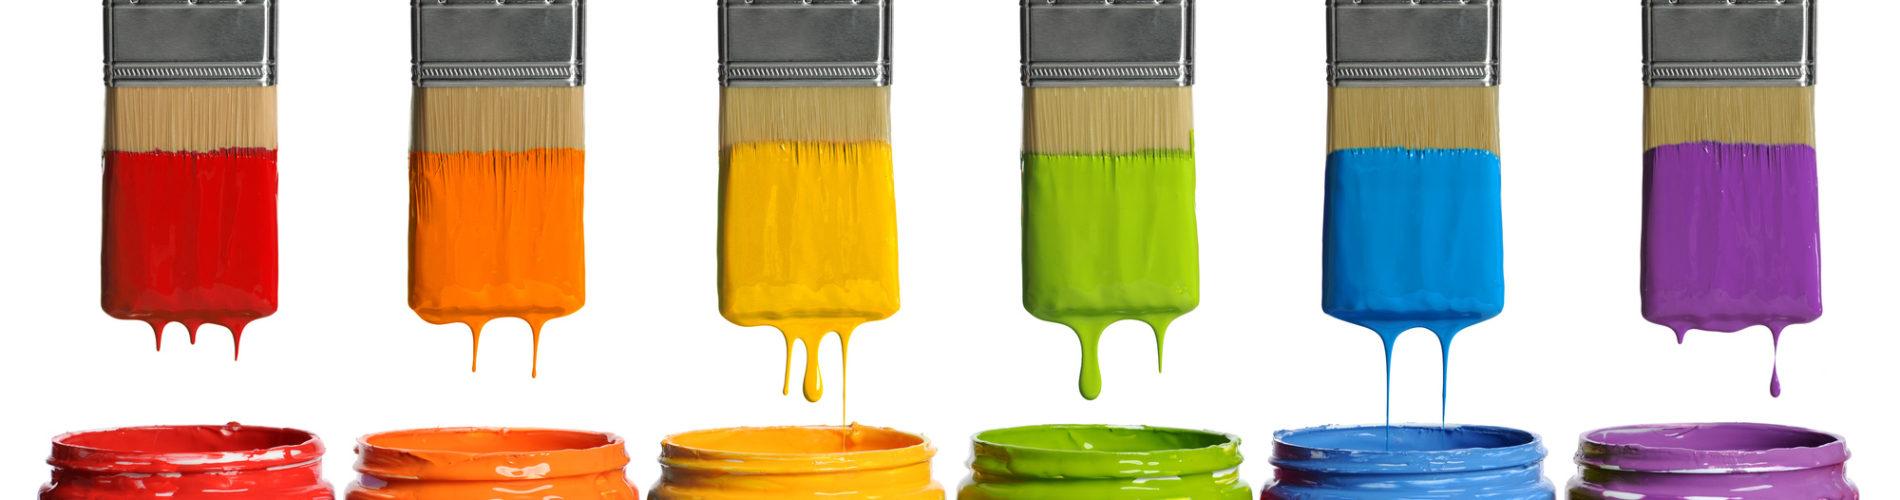 6 paint color trends of 2018. Black Bedroom Furniture Sets. Home Design Ideas